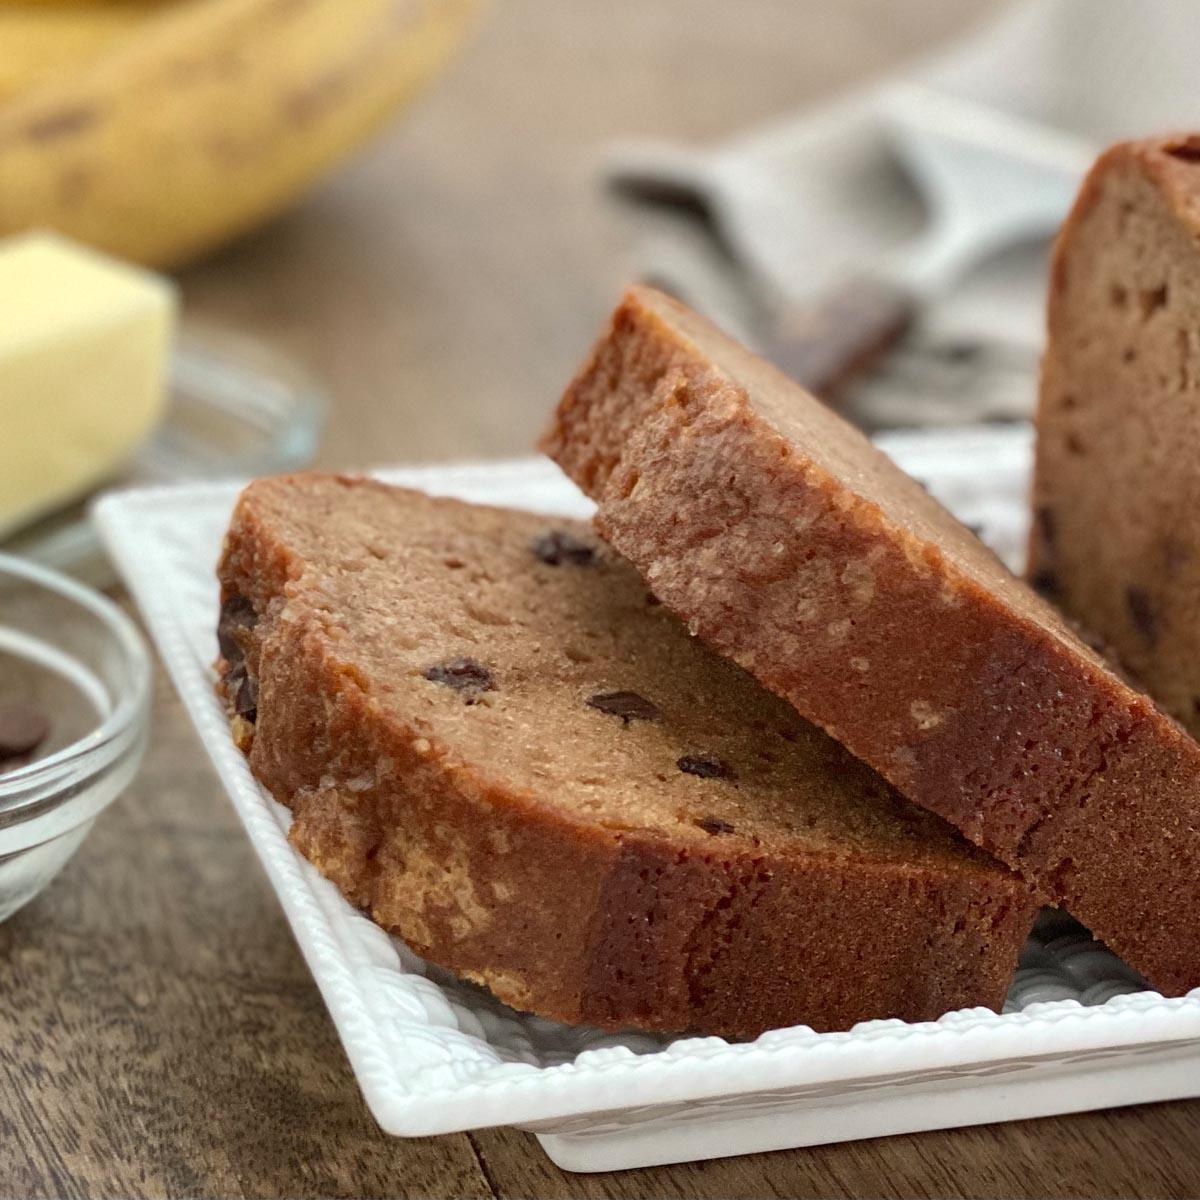 Chocolate Chip Banana Square 5